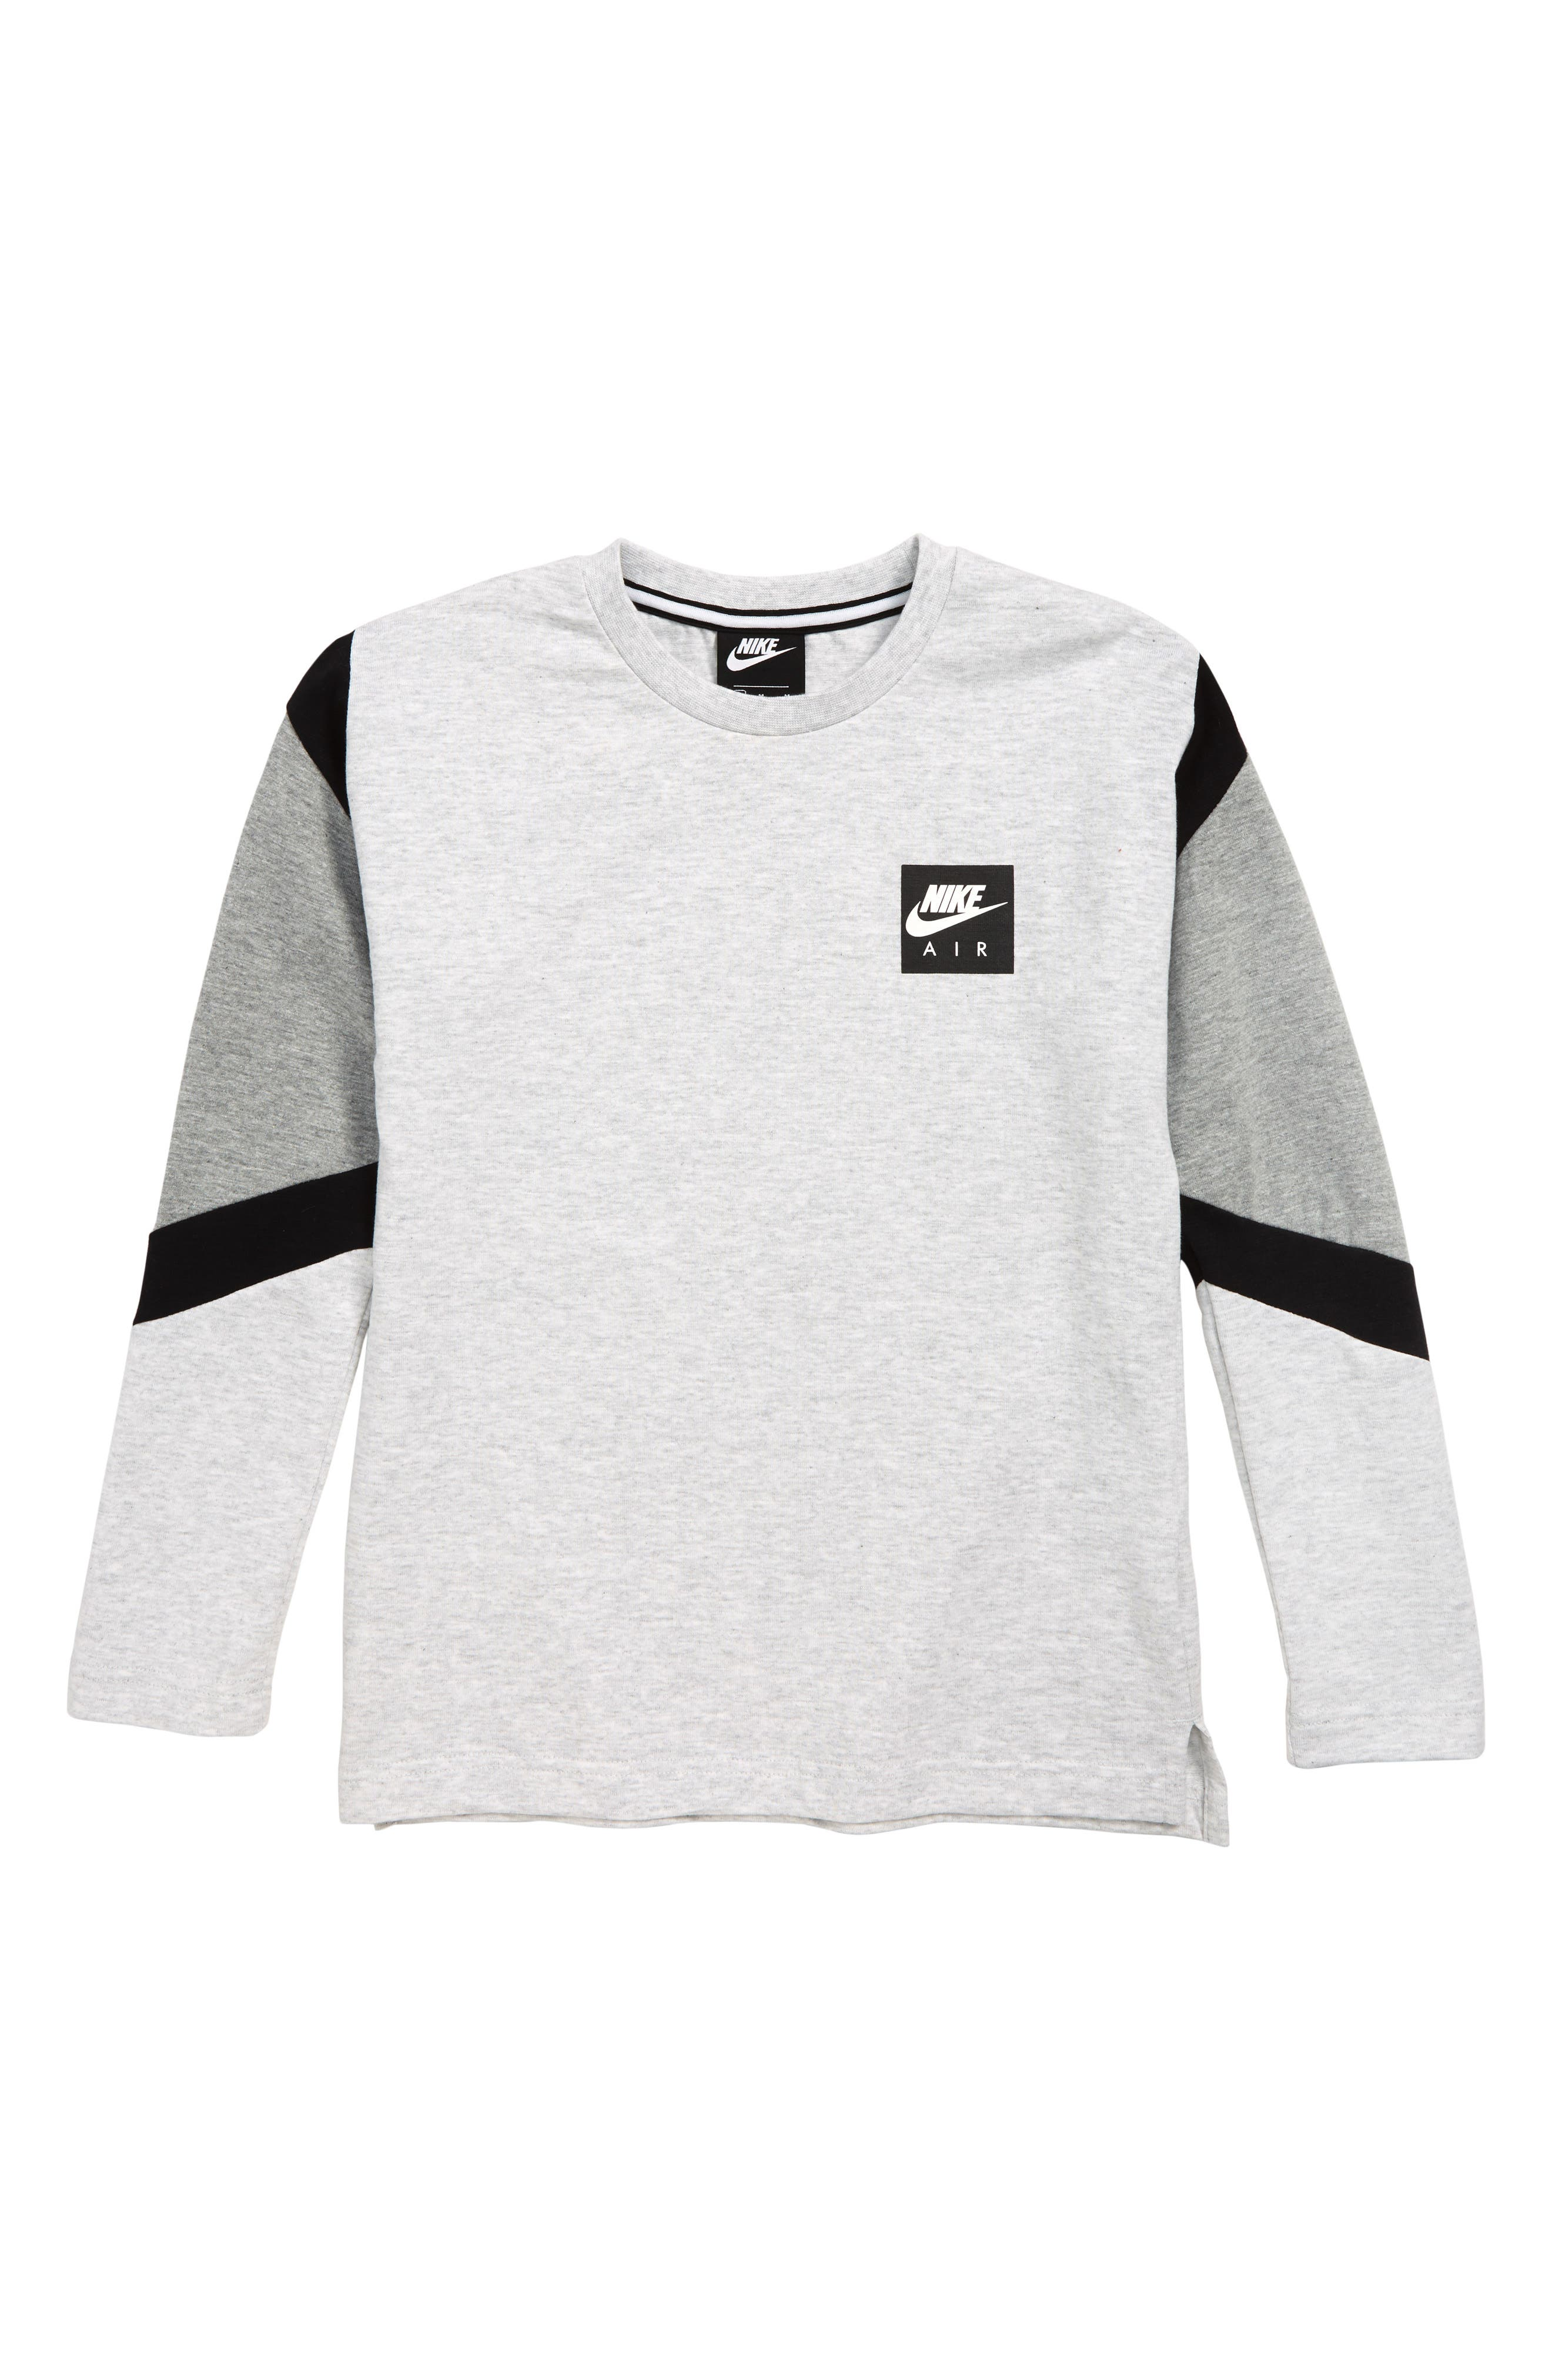 NIKE Air Long Sleeve T-Shirt, Main, color, BIRCH HEATHER